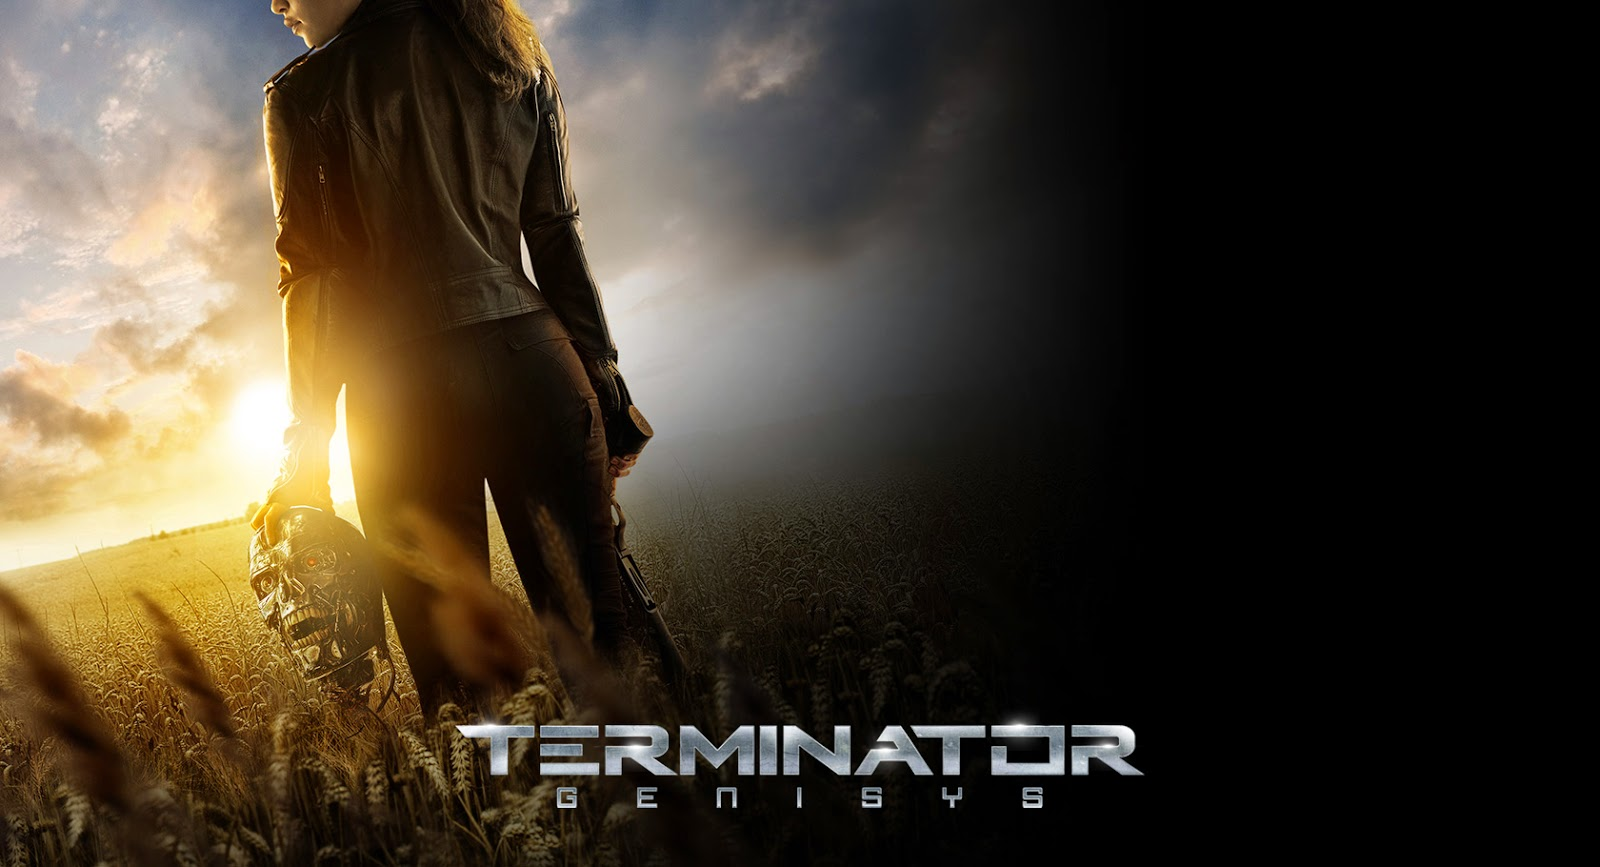 Terminator Genisys 2015 Wallpaper | KFZoom